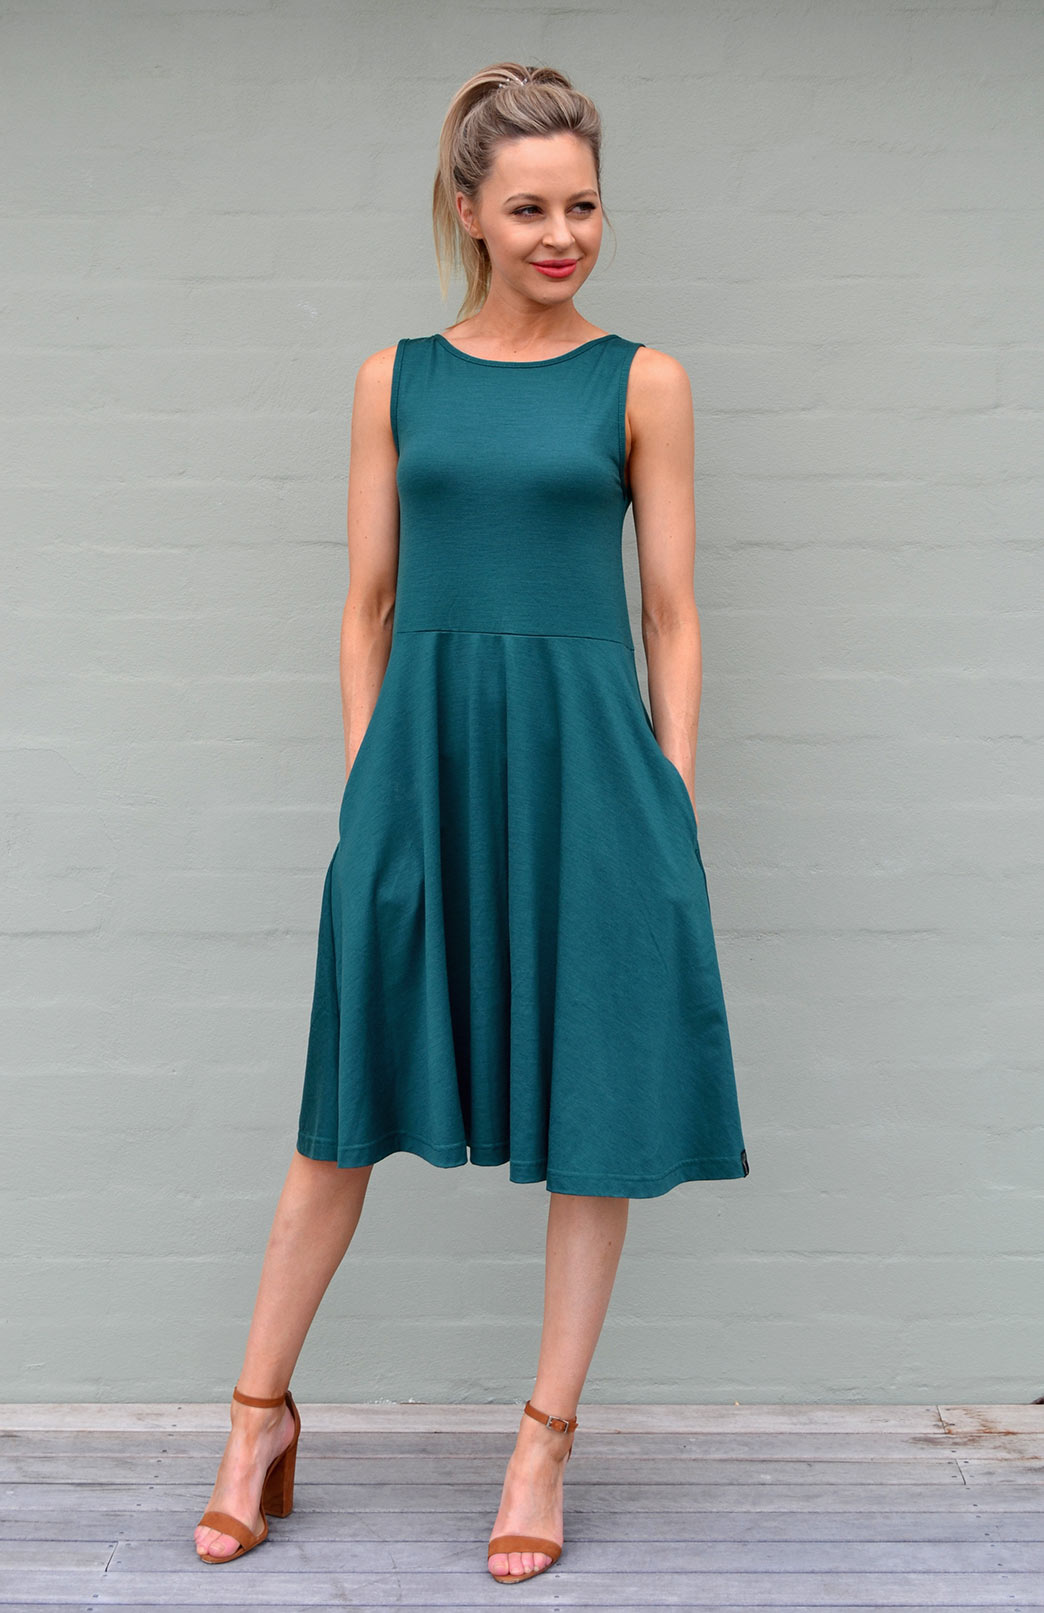 MaryAnn Fit and Flare Dress - Women's Emerald Green Merino Wool Sleeveless Dress with Pockets - Smitten Merino Tasmania Australia